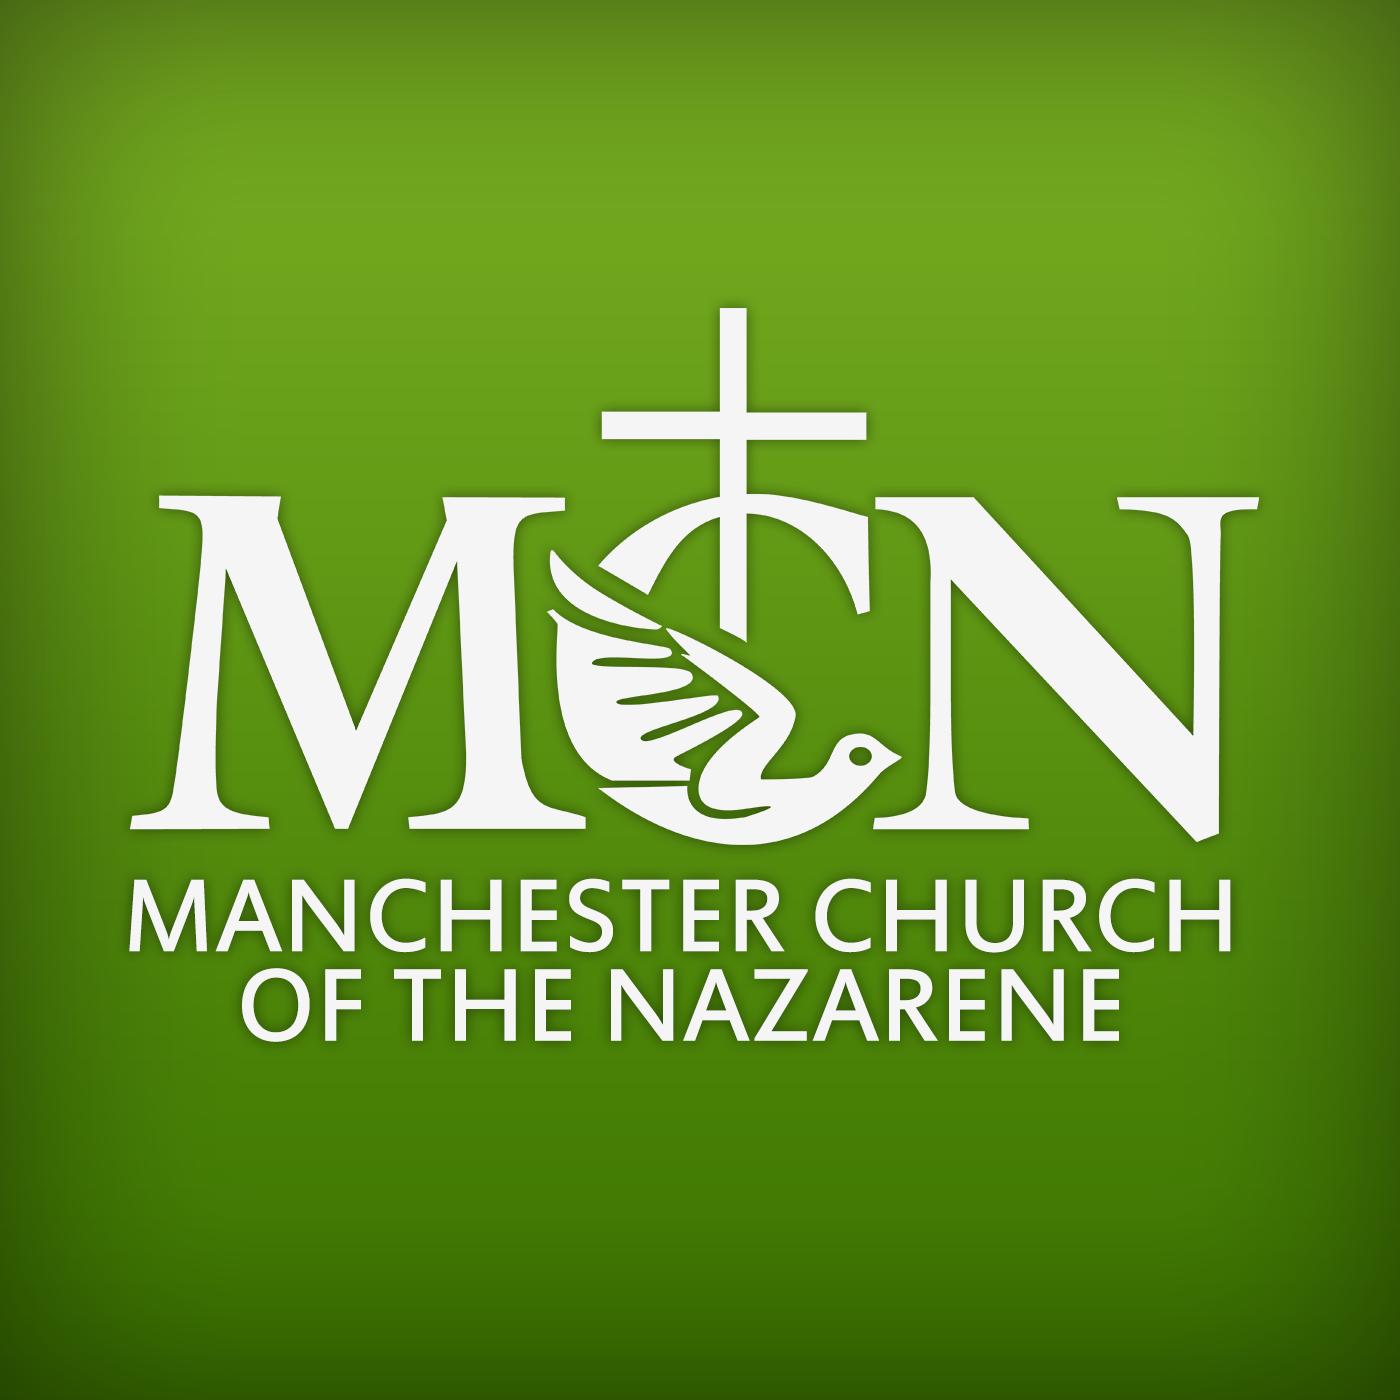 Sermons - Manchester Church of the Nazarene